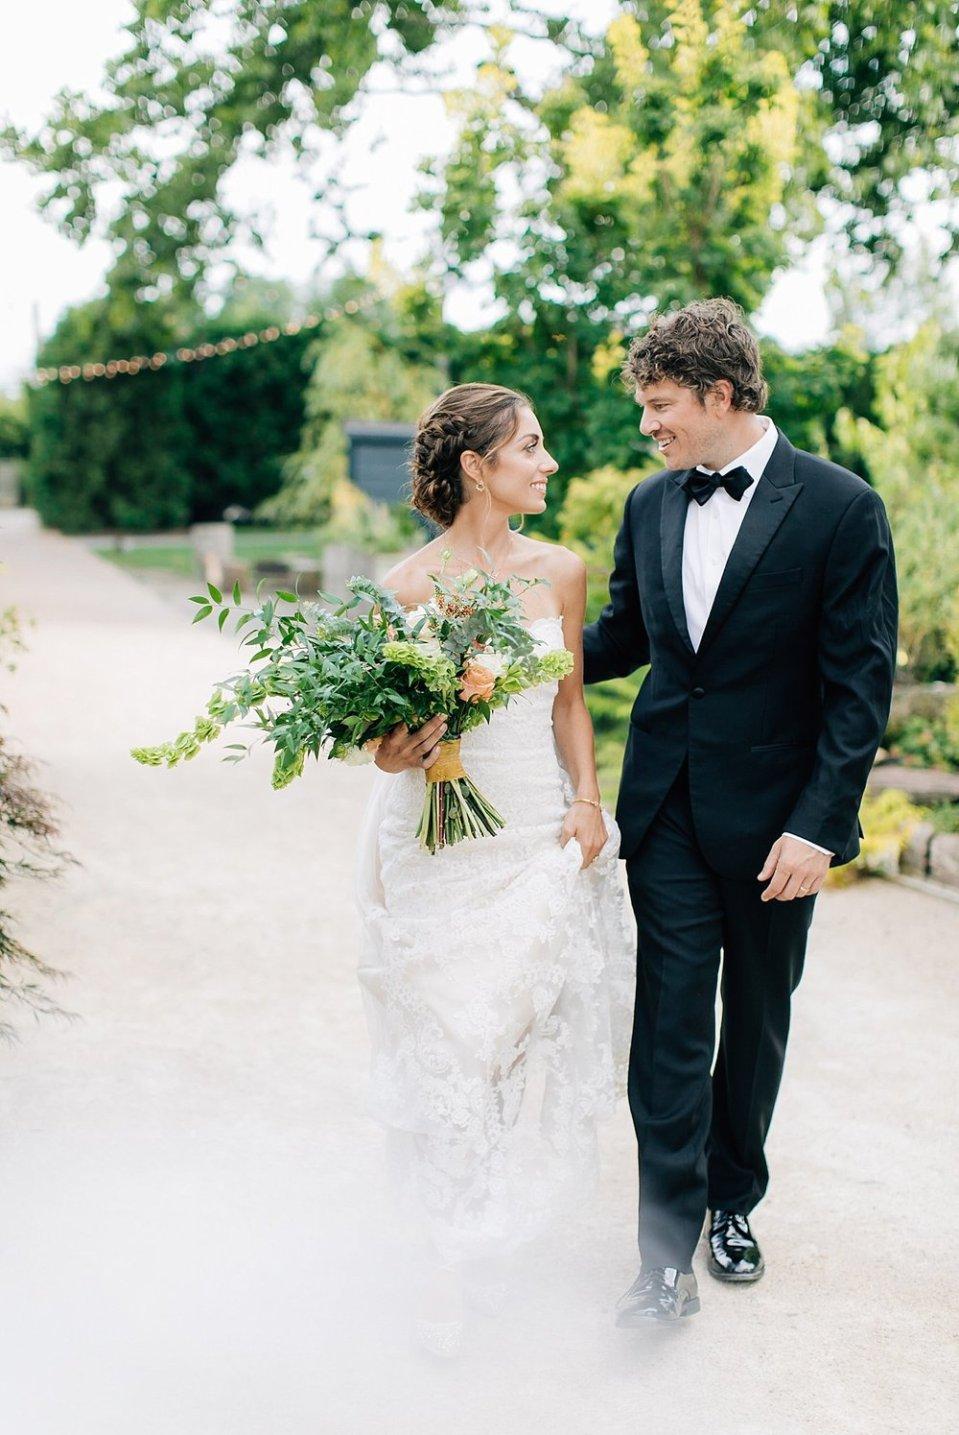 terrain gatherings glen mills pa romantic garden wedding photography magdalena studios 0031